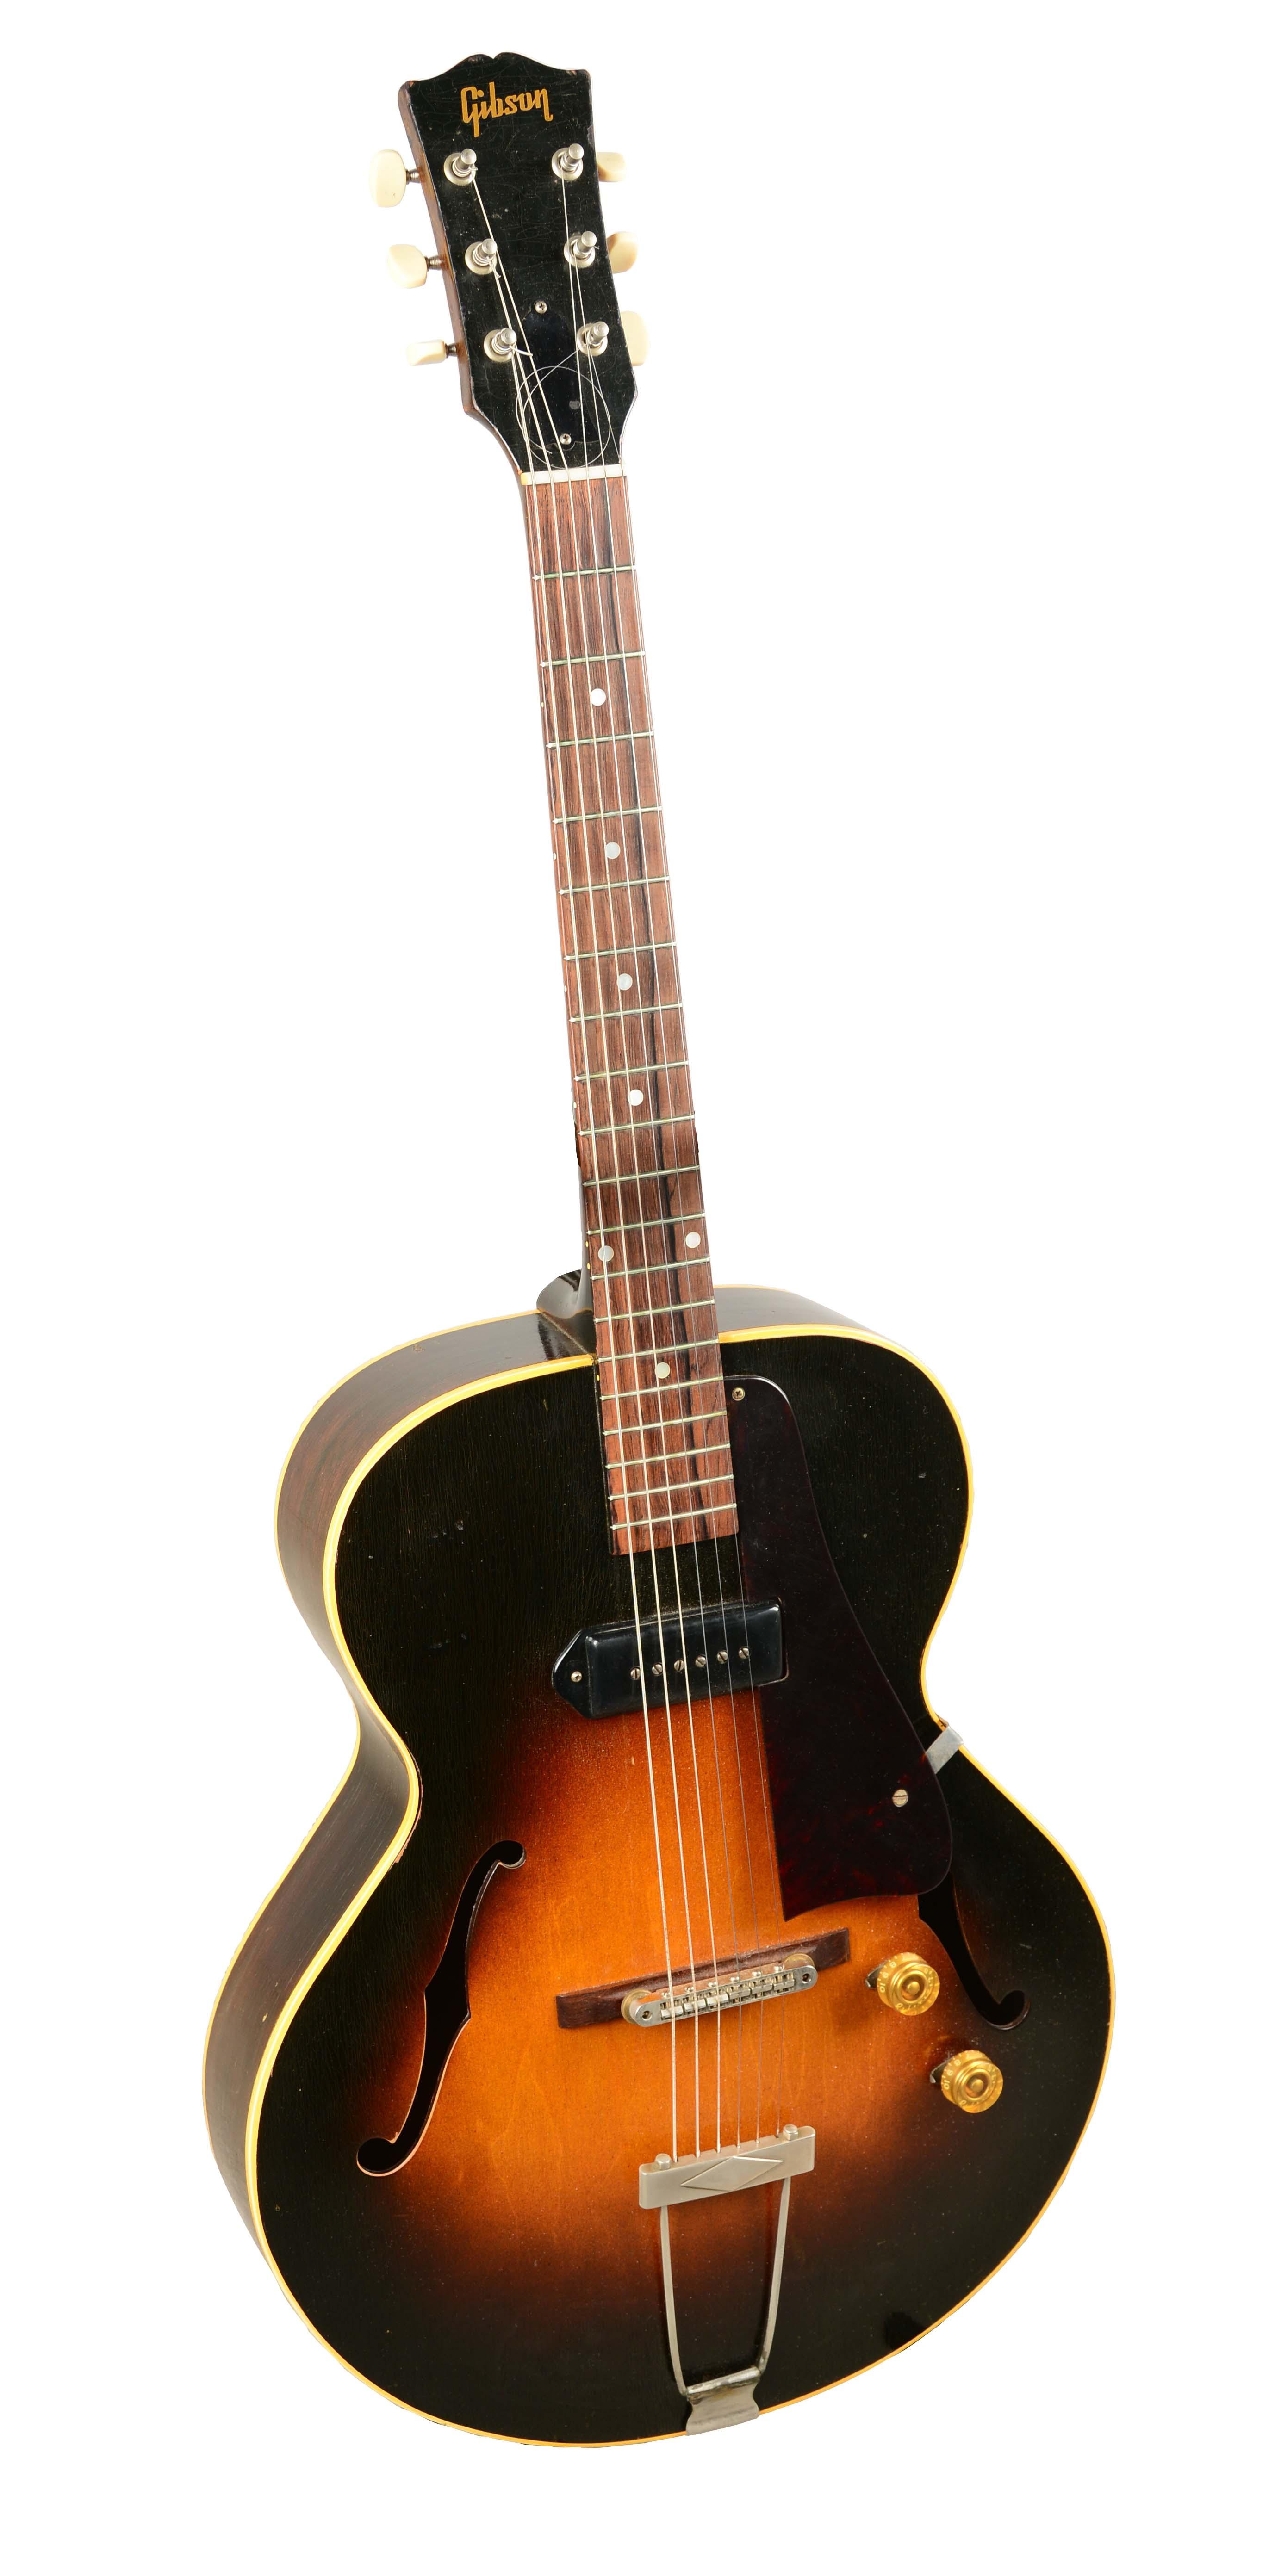 lot detail gibson es 125 acoustic electric guitar. Black Bedroom Furniture Sets. Home Design Ideas